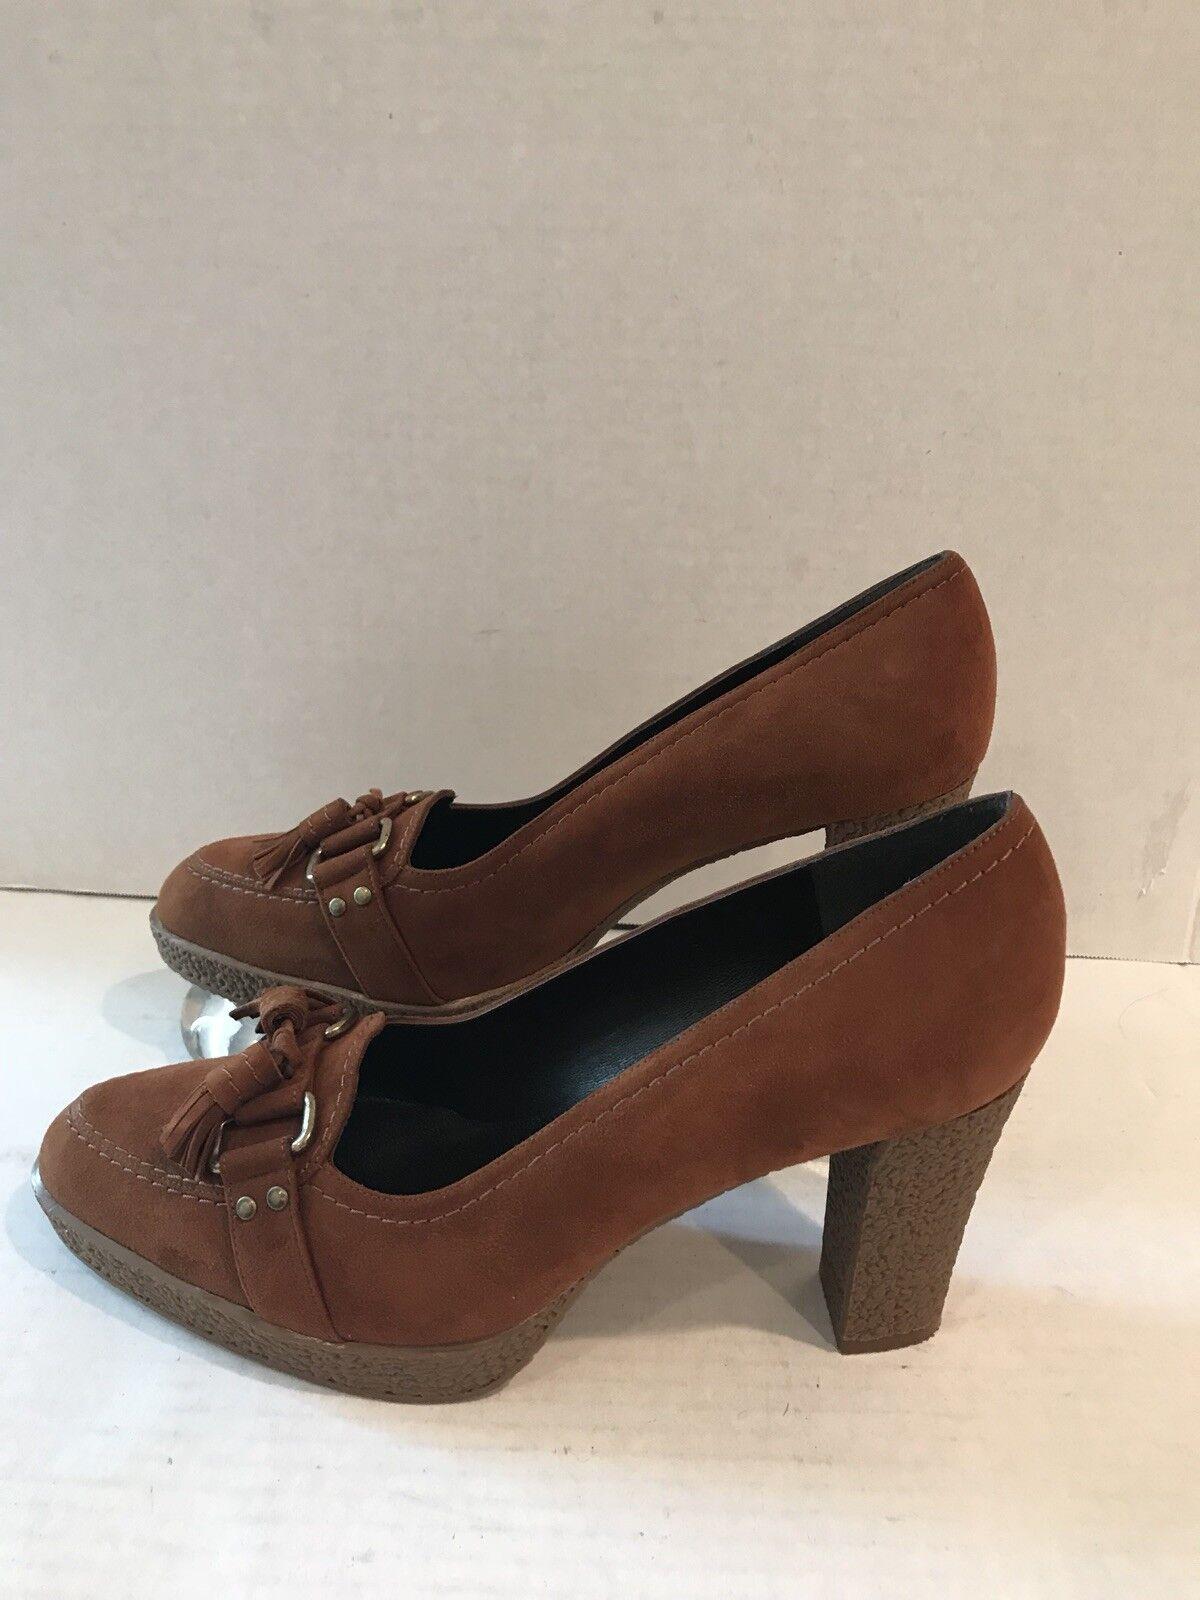 Stuart Weitzhomme Femmes Chaussures Daim Marron Talon Pointure 8M 3w51659